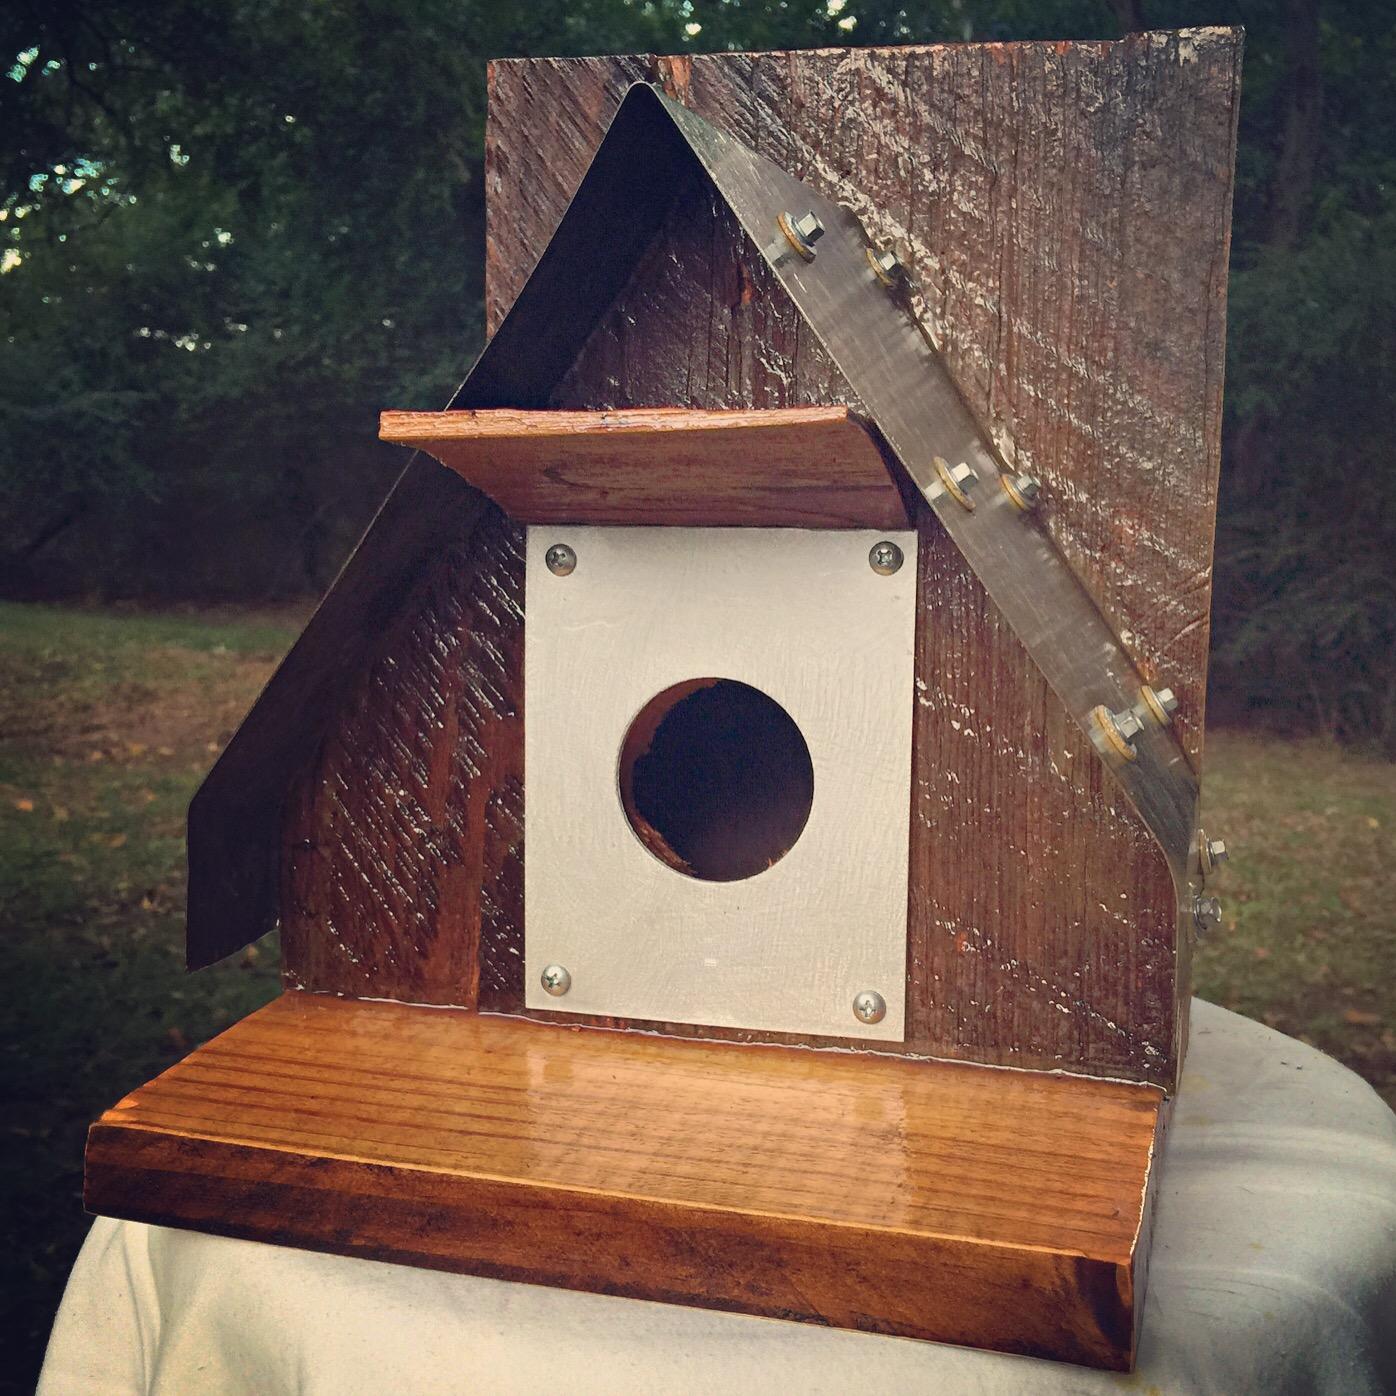 Squirrel-proof Birdhouse